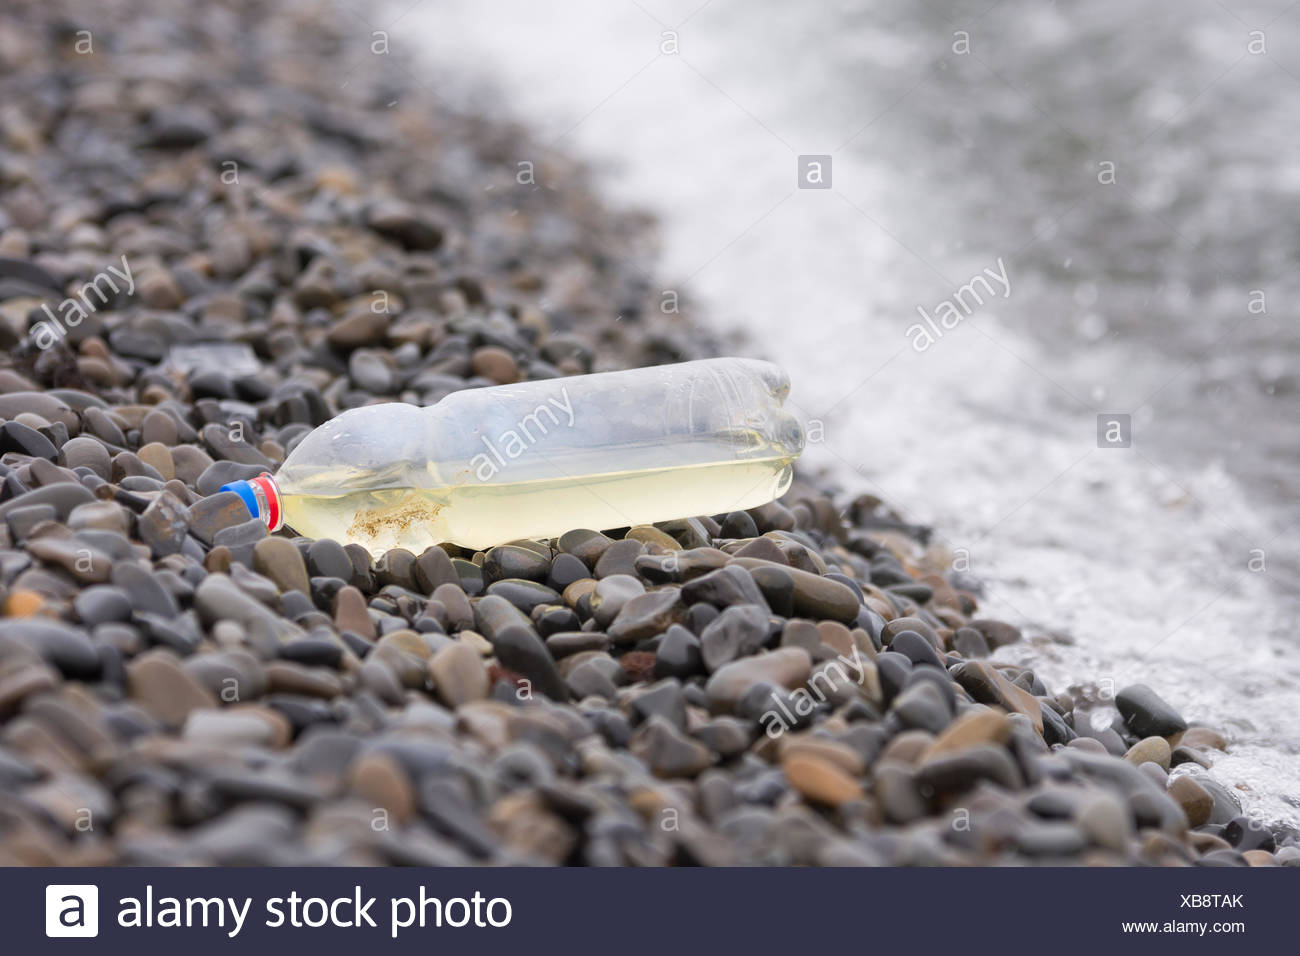 Plastic bottle lying on the pebbly seashore - Stock Image